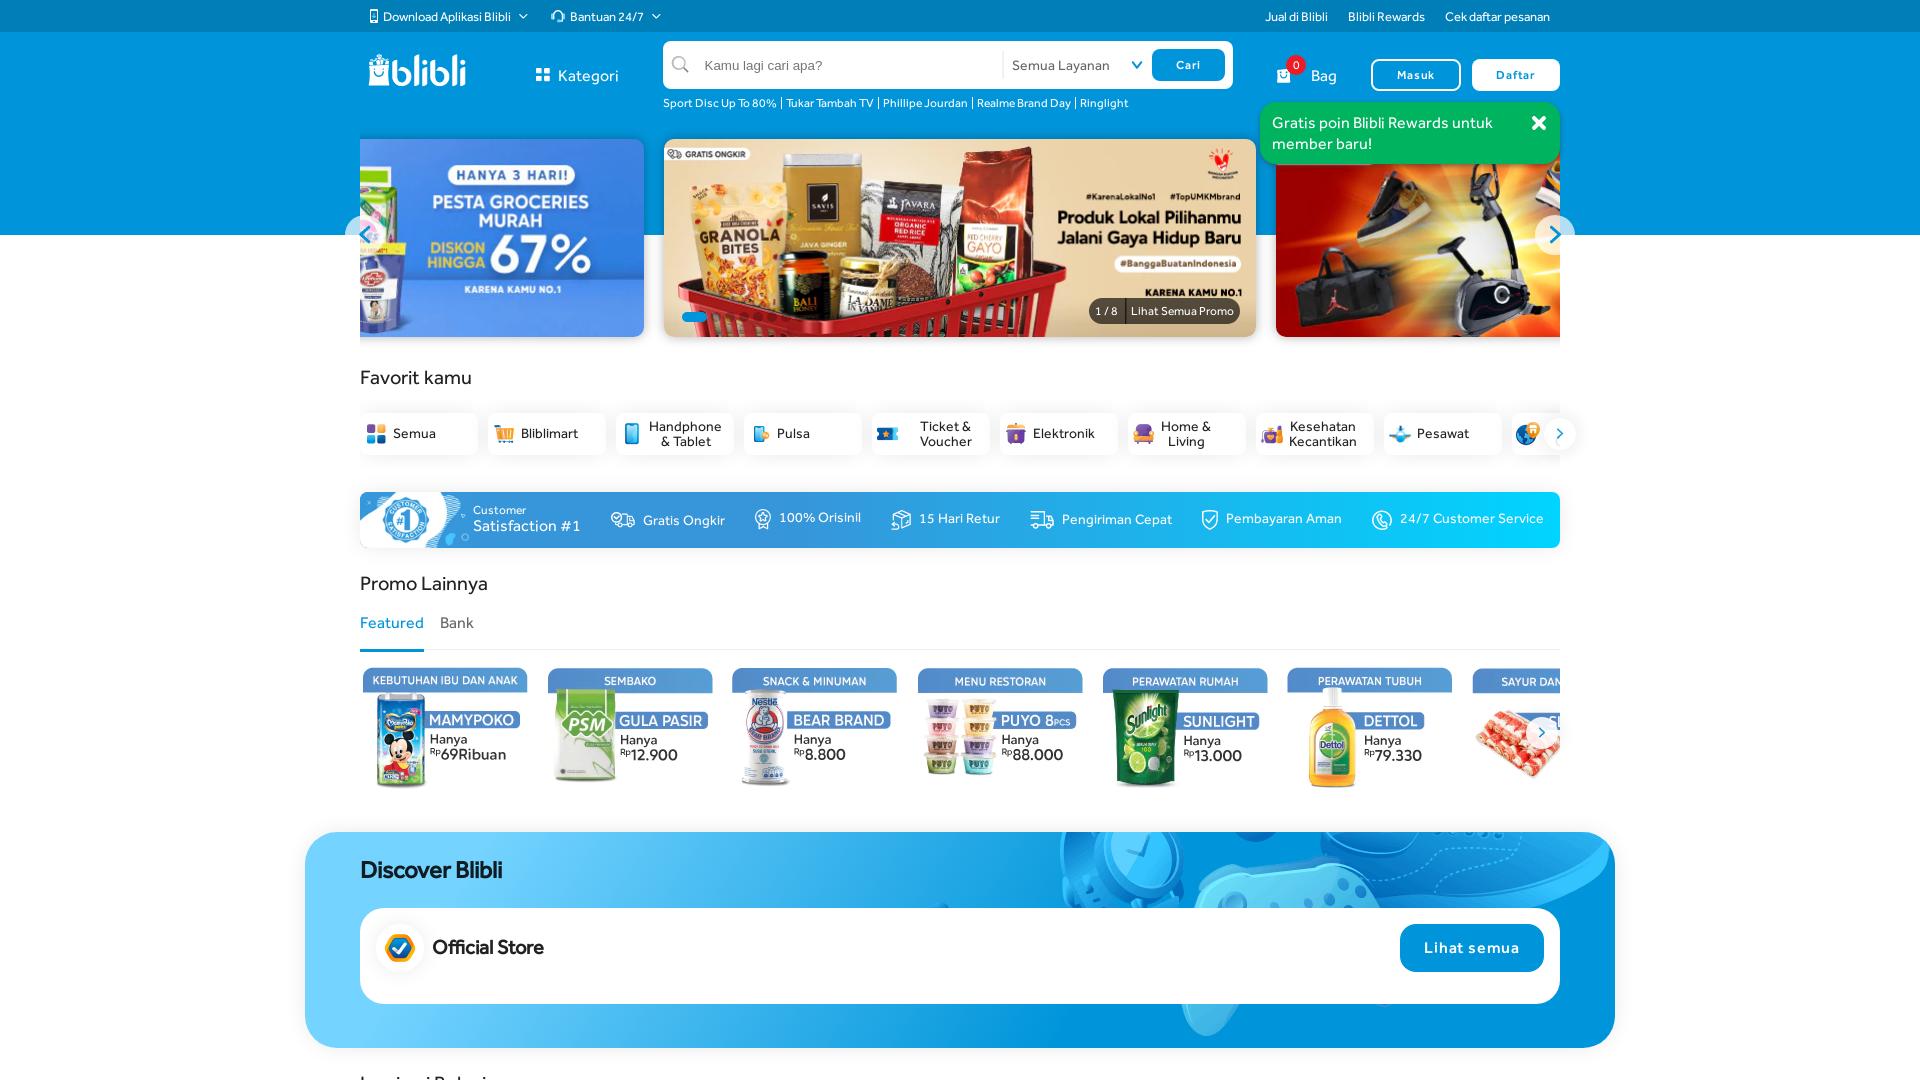 Blibli.com website